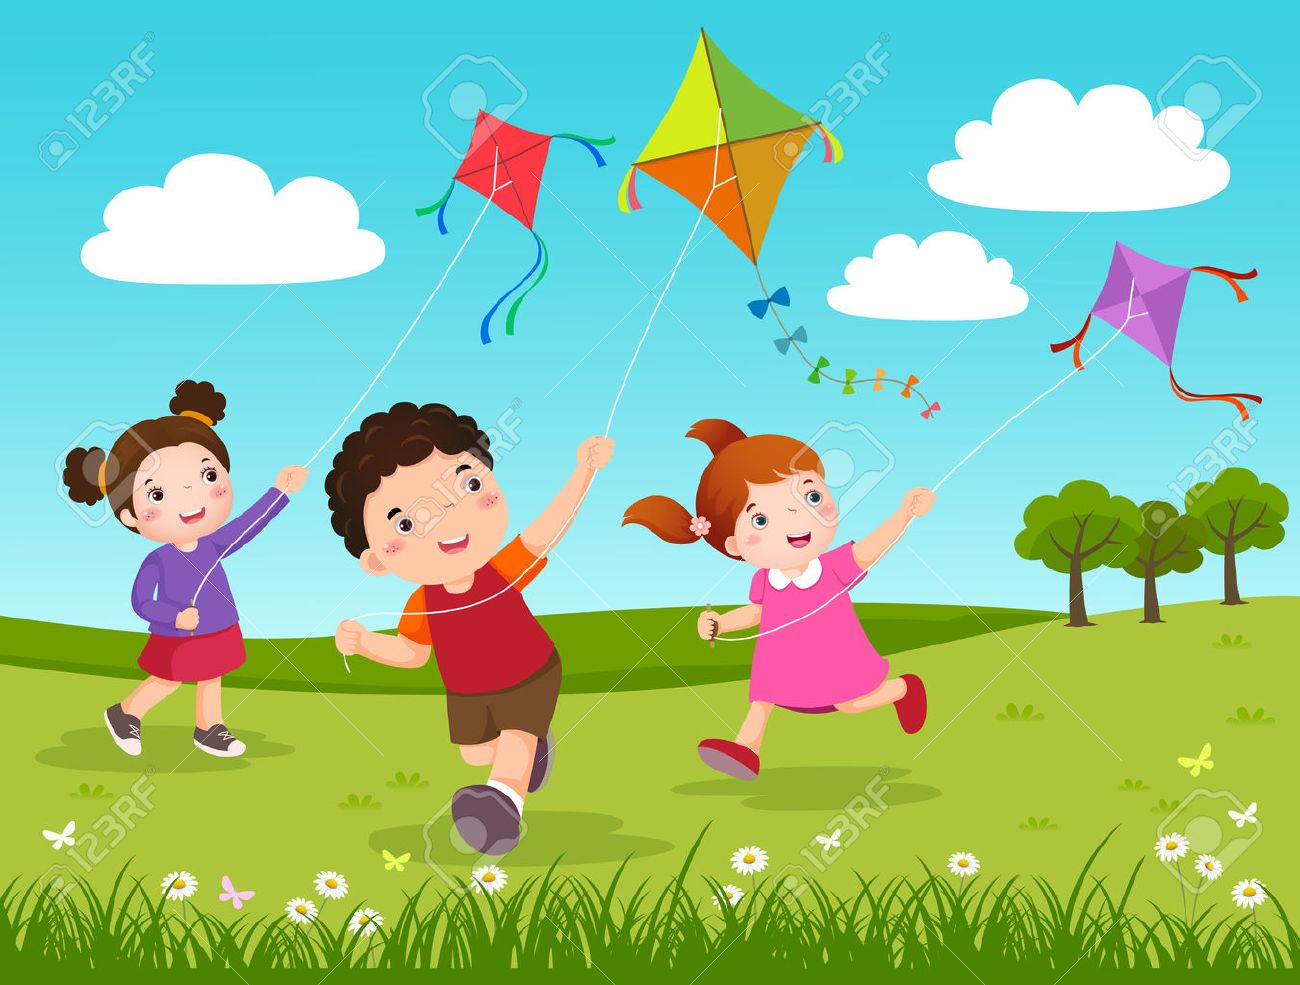 Vector Illustration of three kids flying kites in the park - 53195113